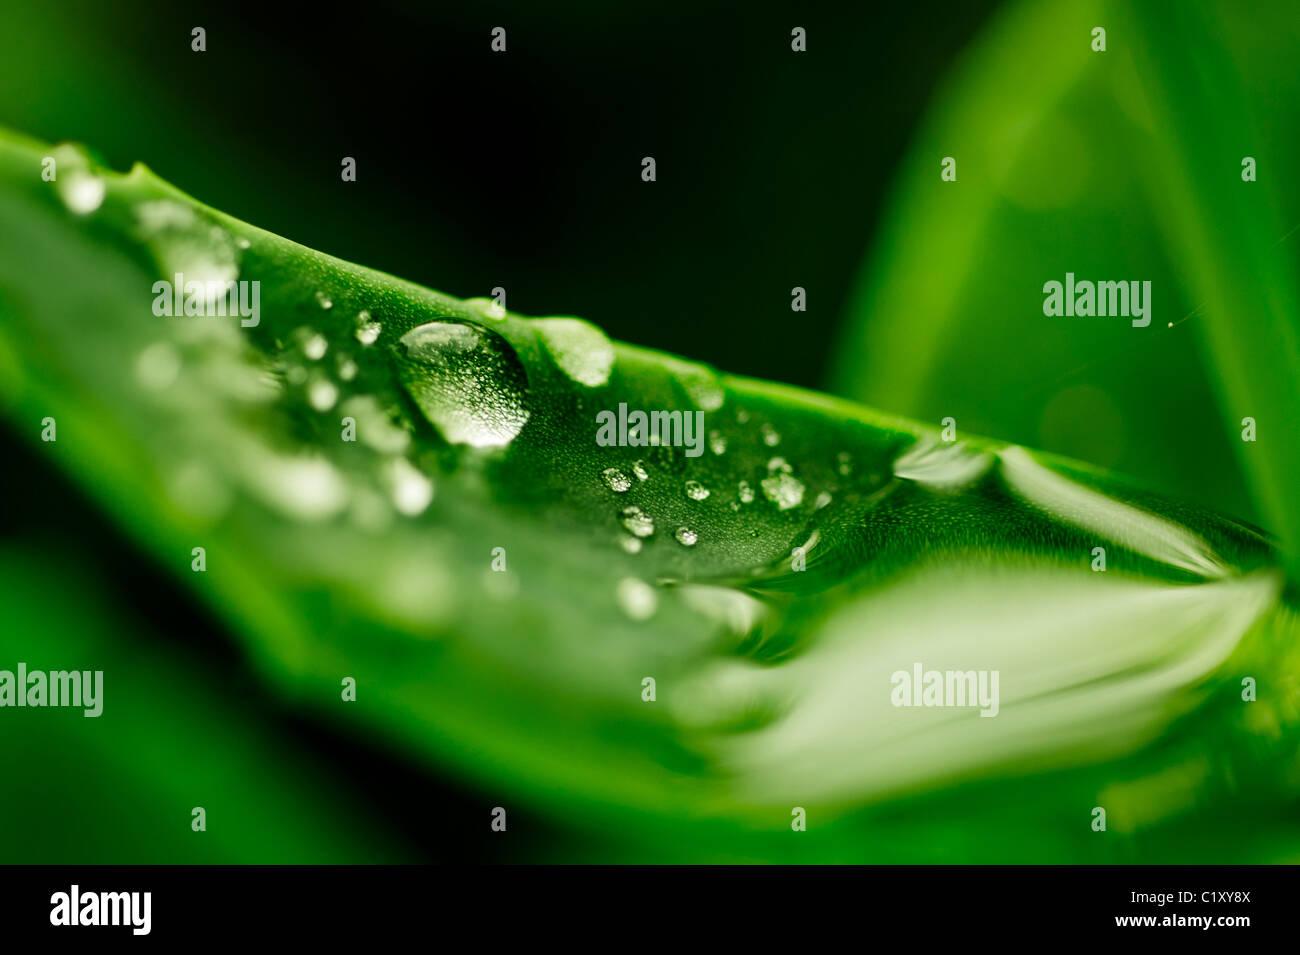 Gotas de agua sobre una hoja verde vibrante Imagen De Stock